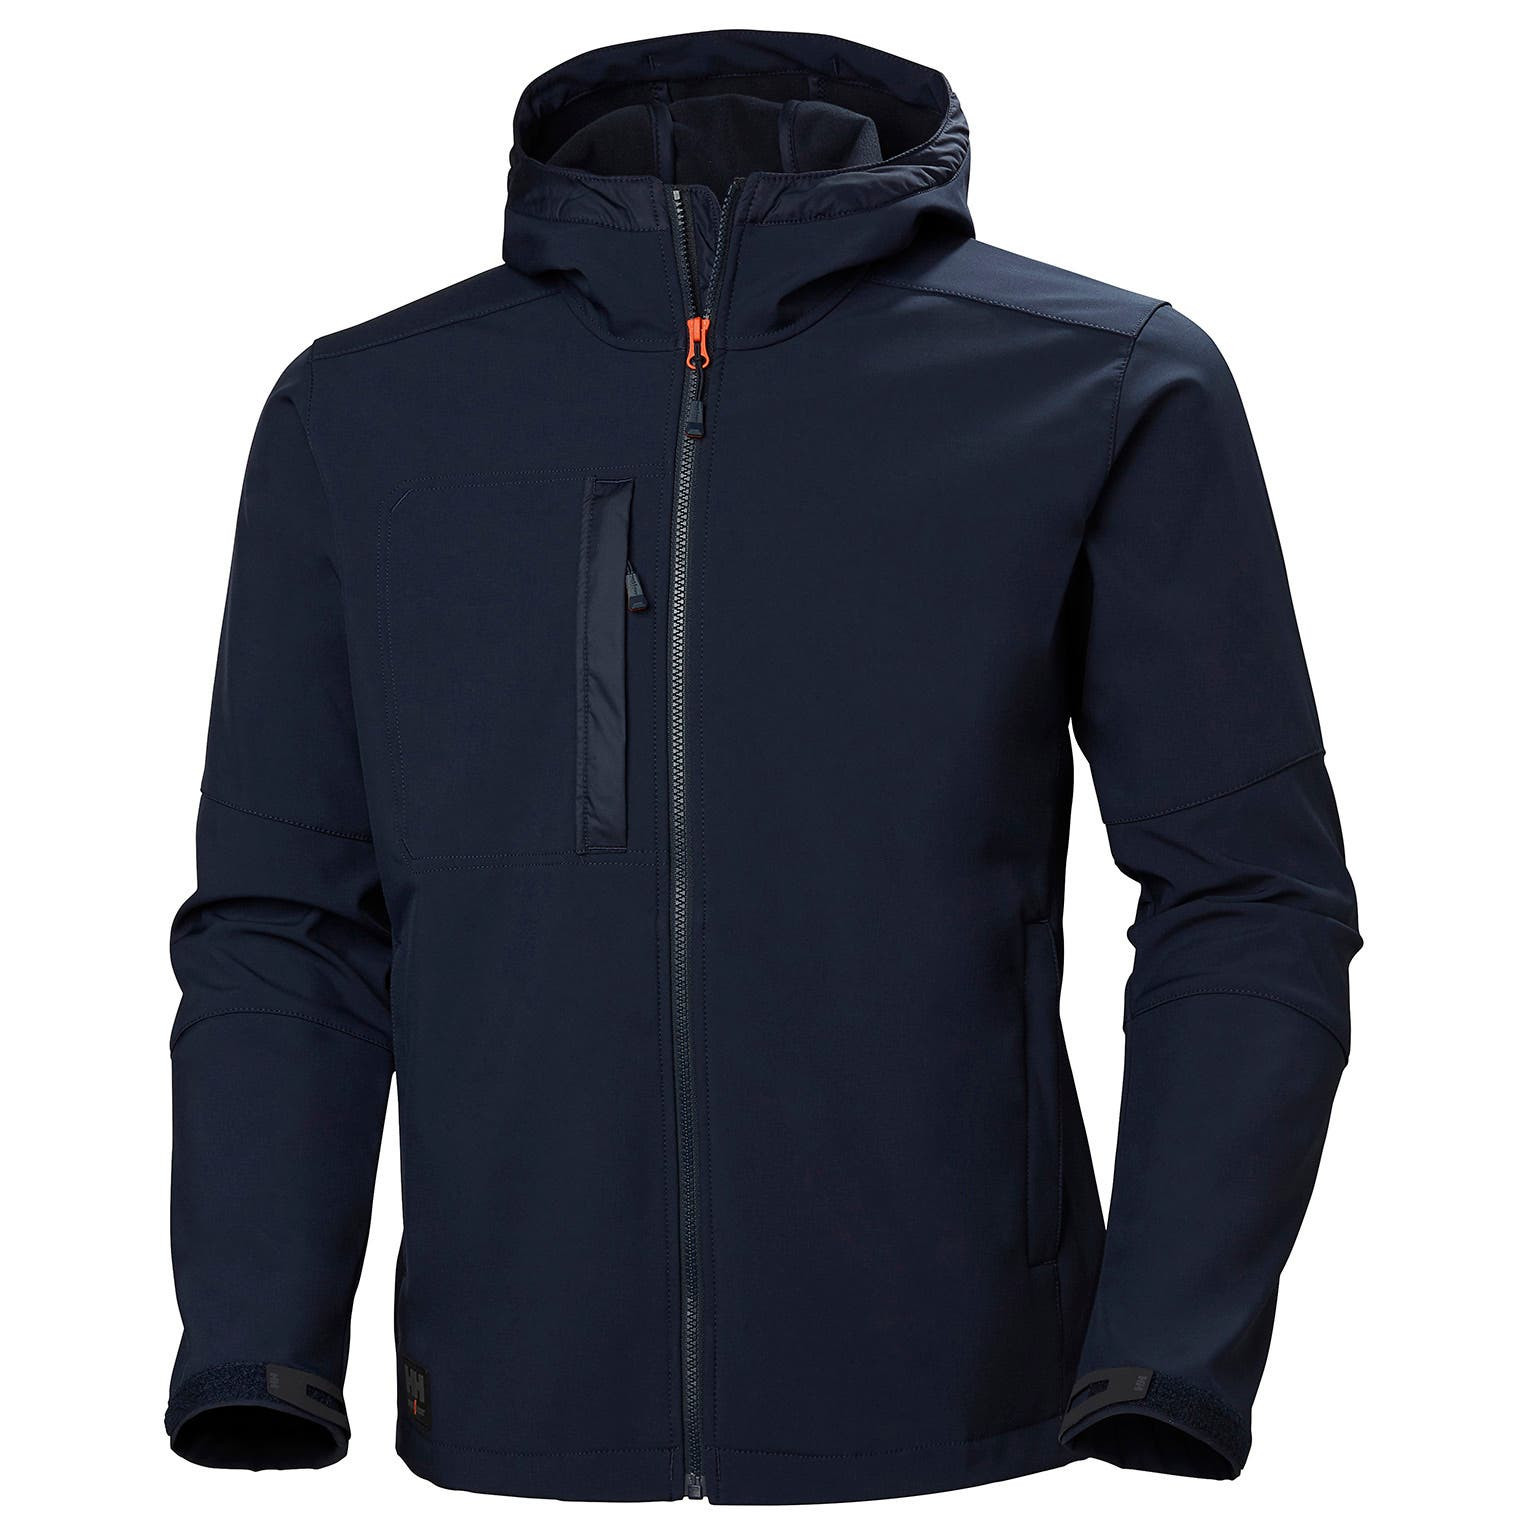 Куртка Helly Hansen Kensington Hooded Softshell - 74230 (Navy; XL)